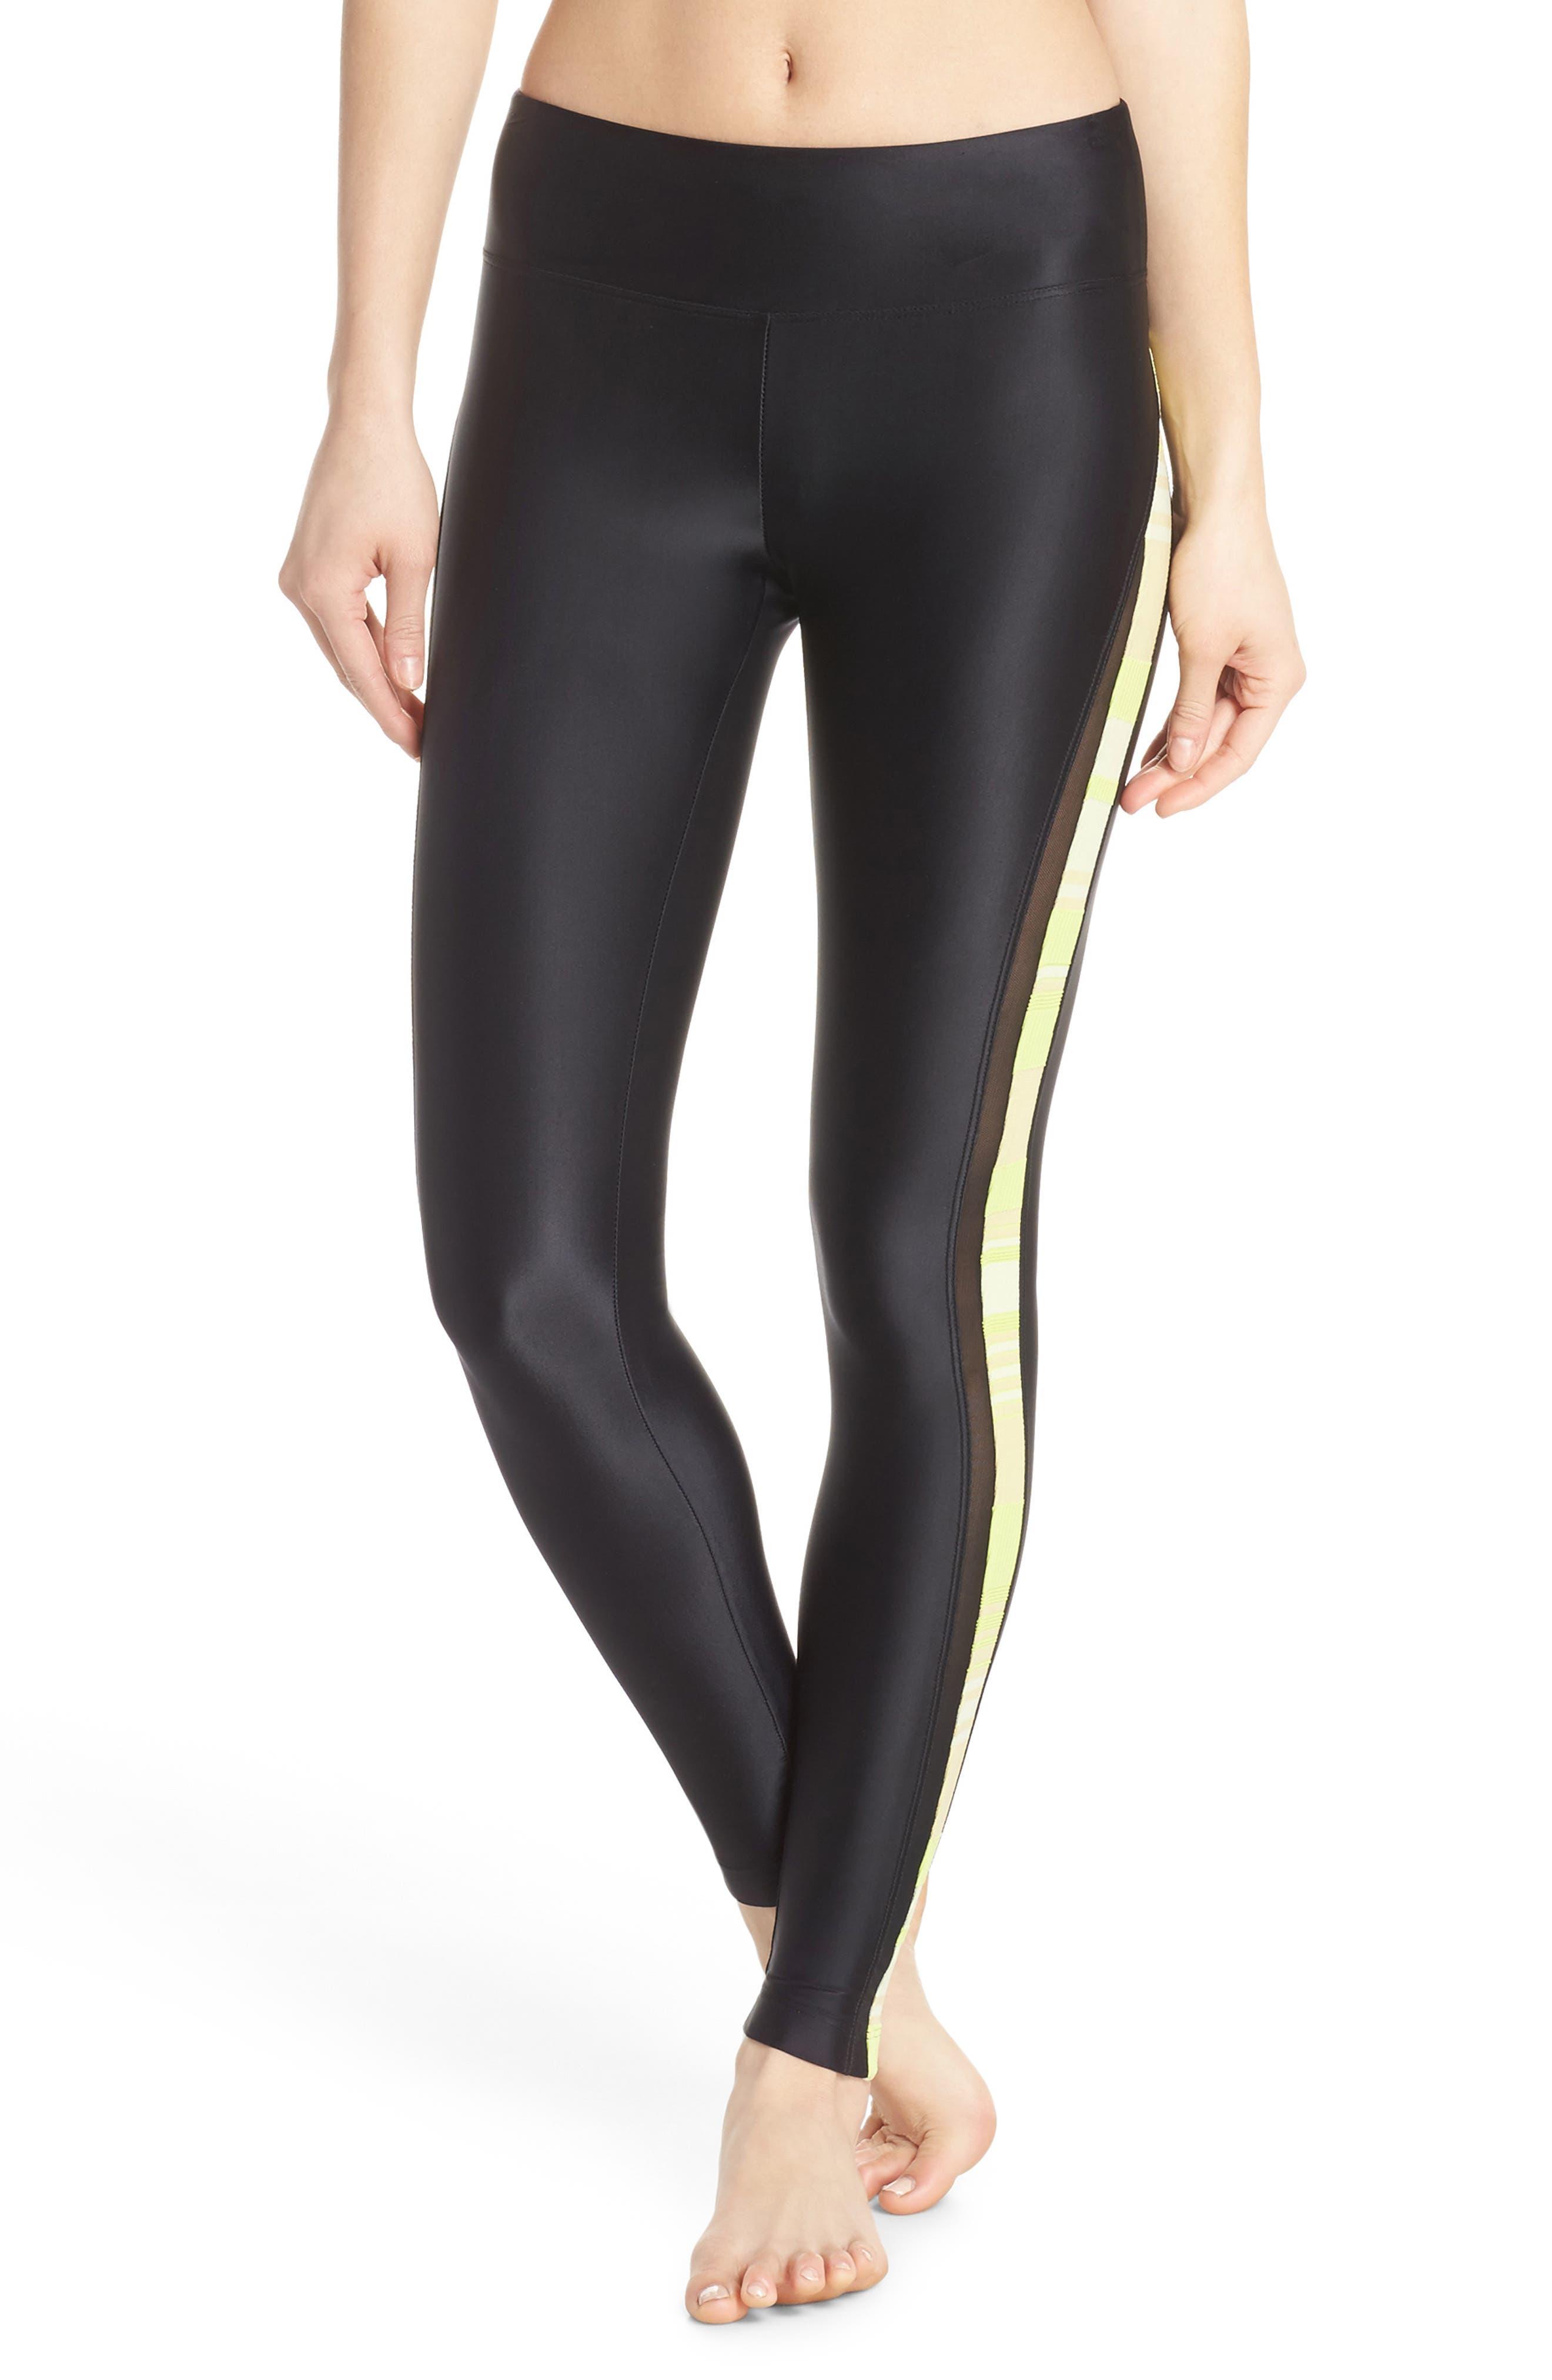 Tide Leggings,                         Main,                         color, BLACK/ LIME